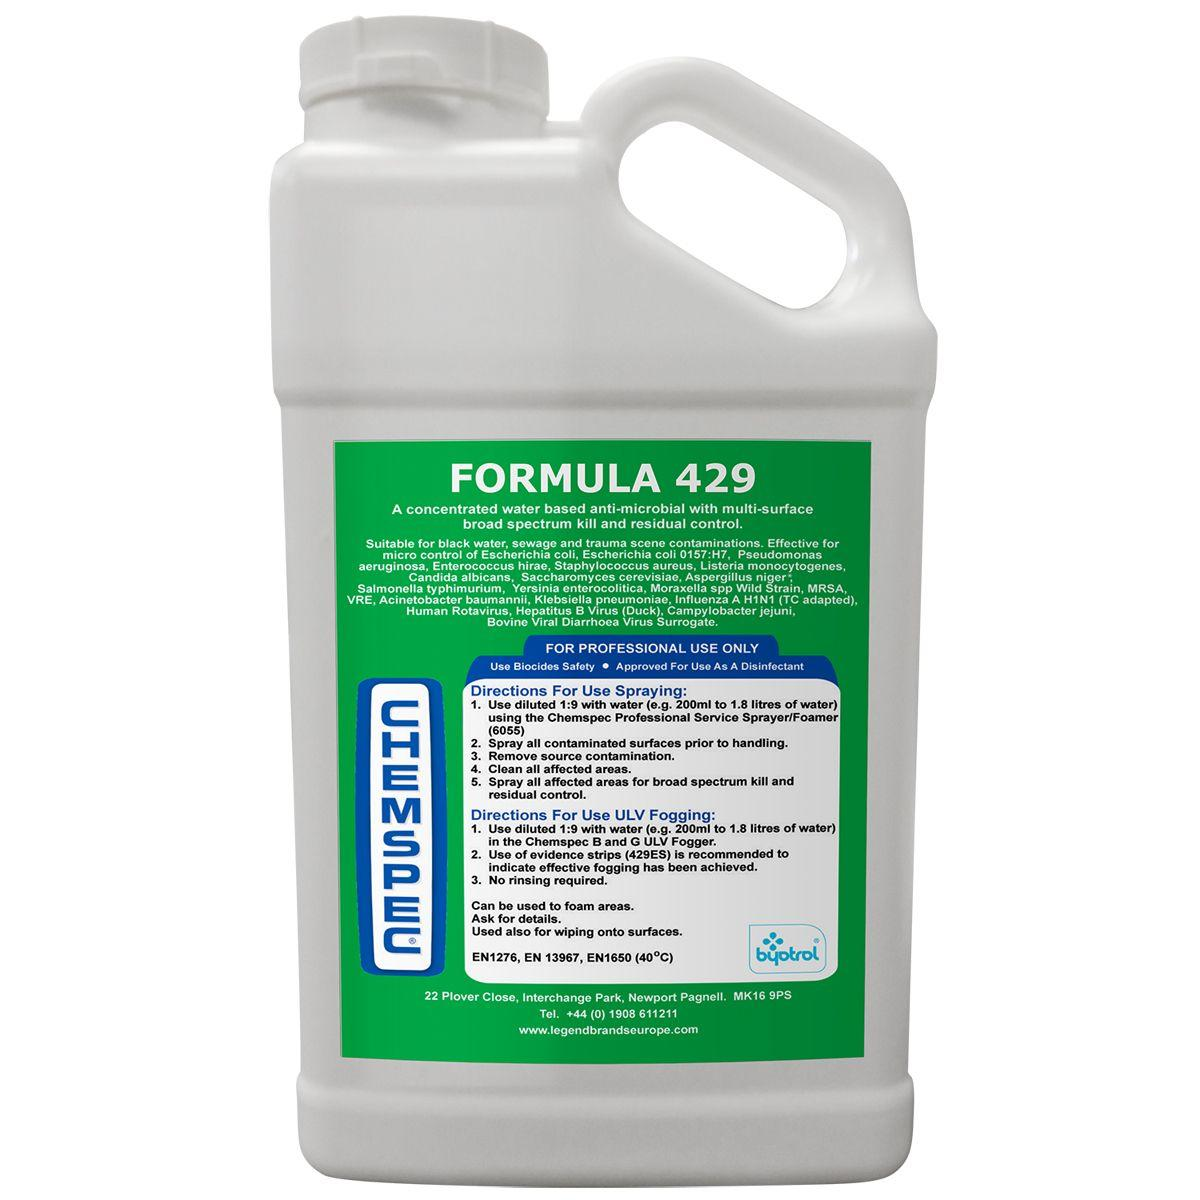 contain-er-formula-429-disinfectant.jpg